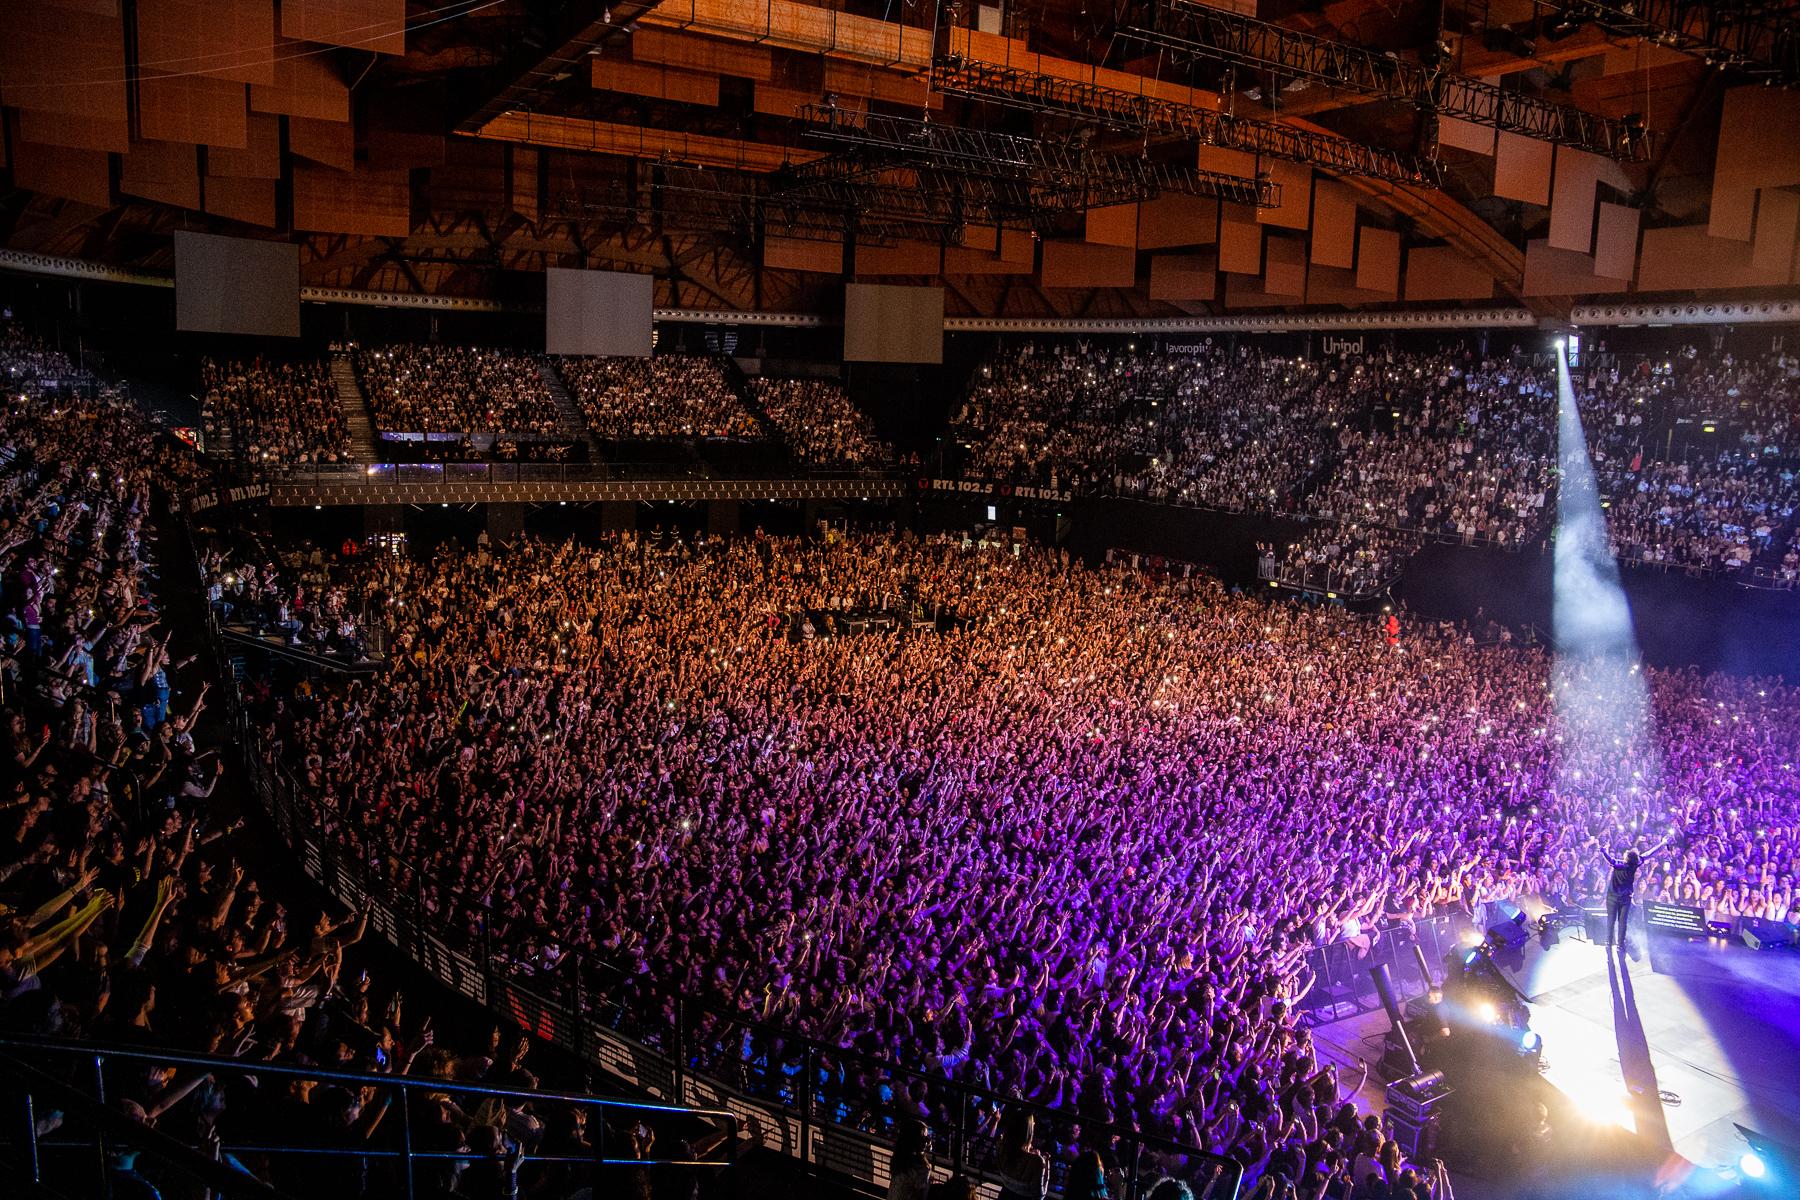 Lo splendido sold out di Ultimo all'Unipol Arena | Unipol Arena